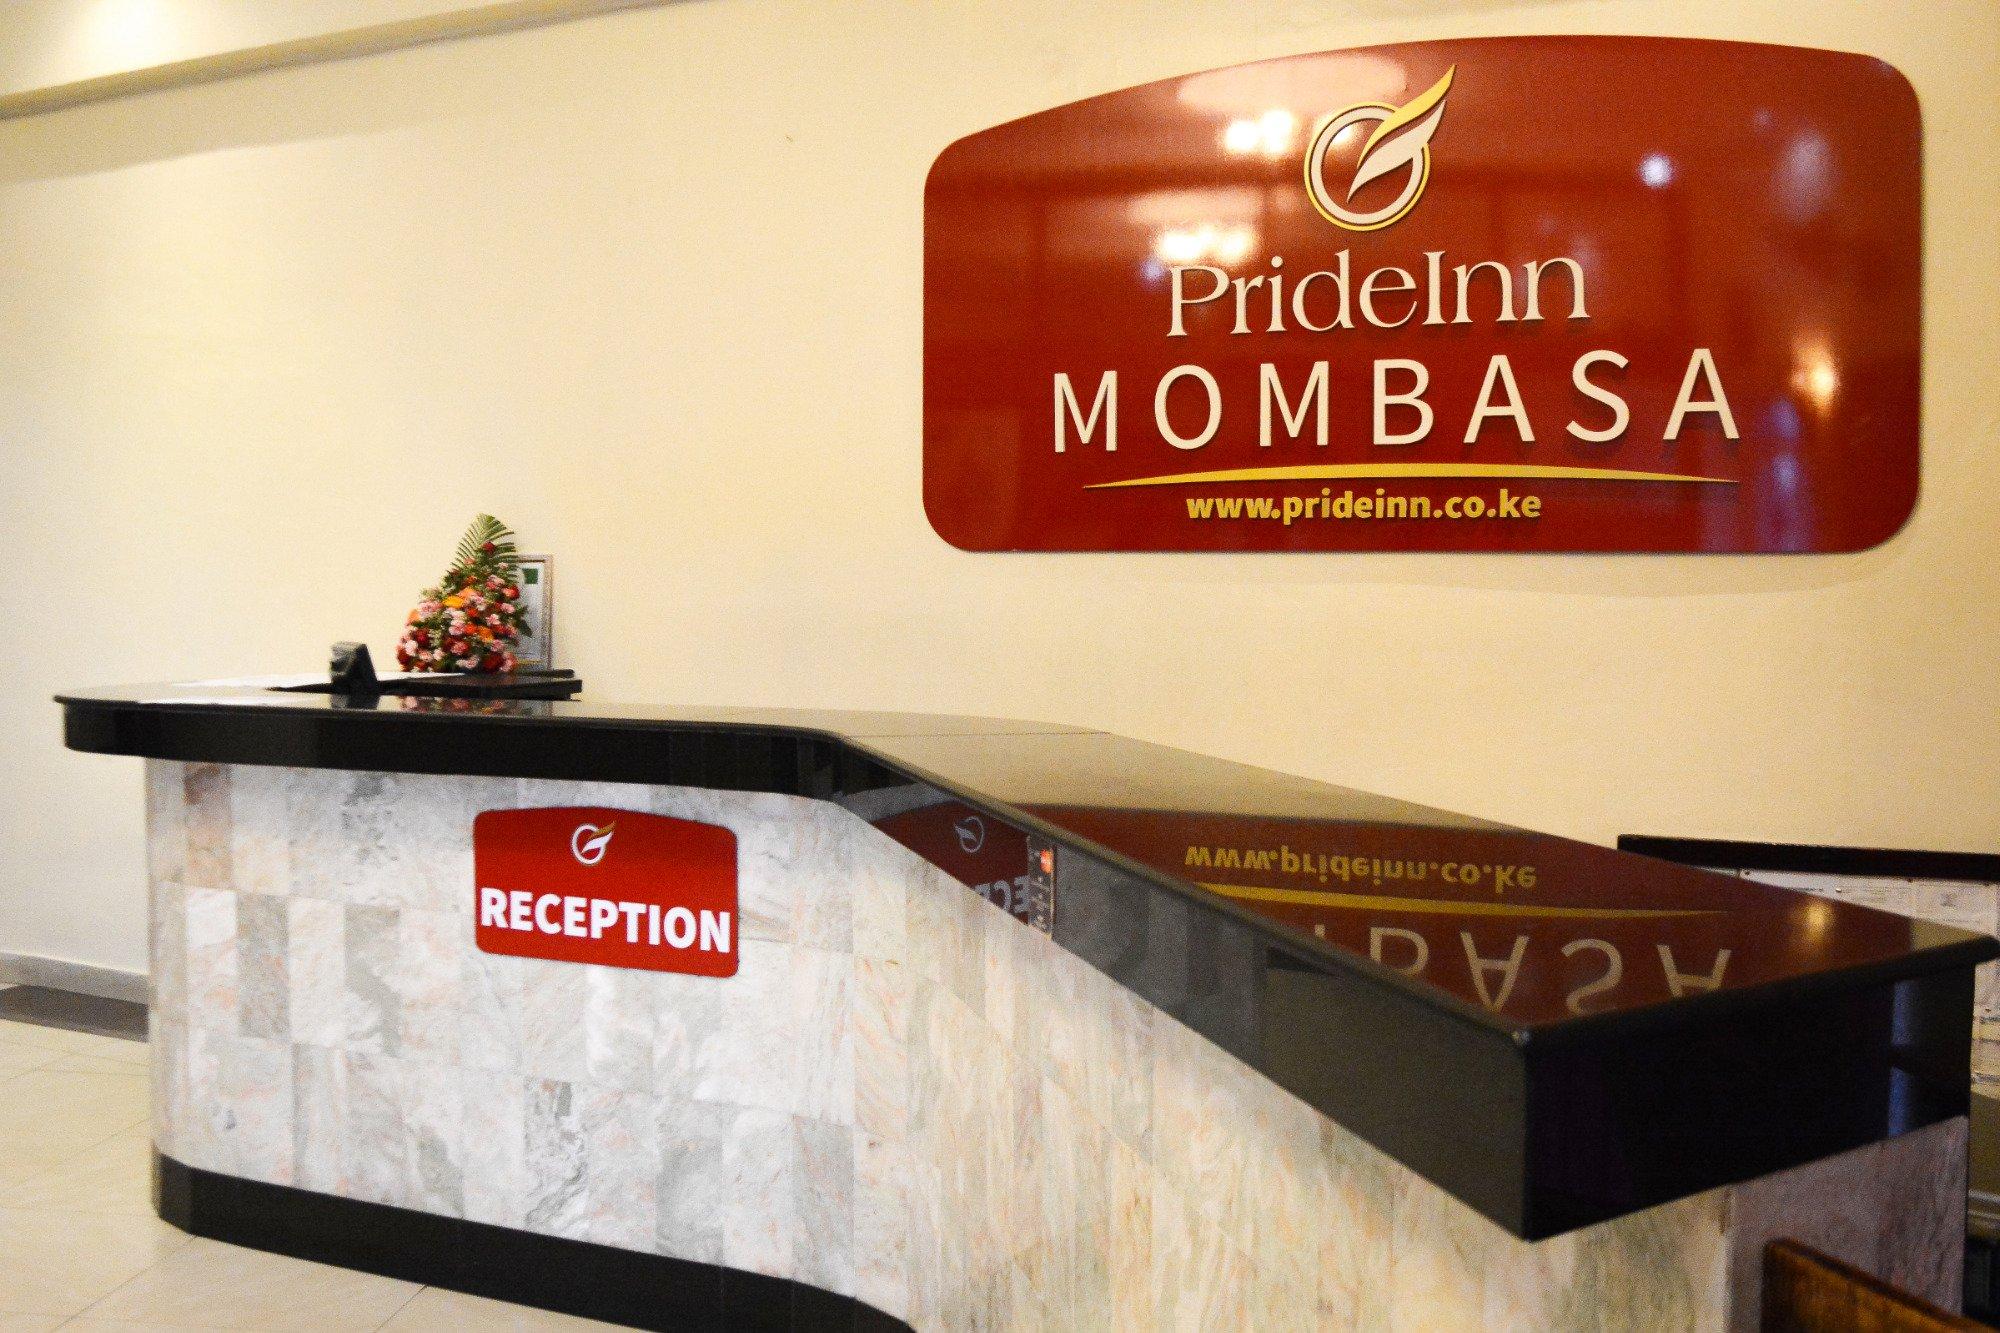 PrideInn Hotel Mombasa